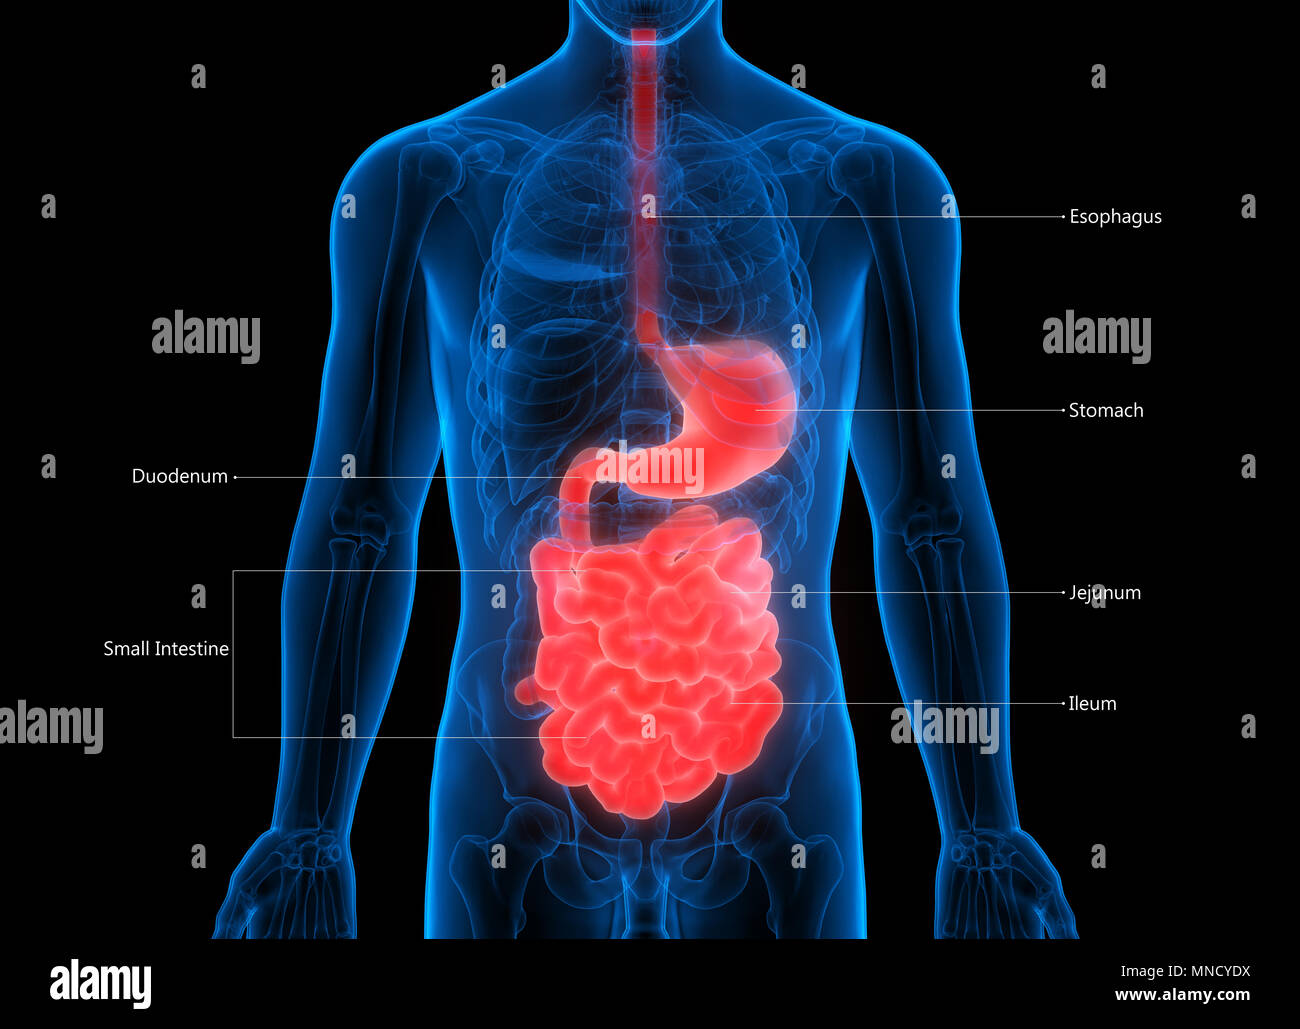 Human Digestive System Stomach with Small Intestine Anatomy Stock ...